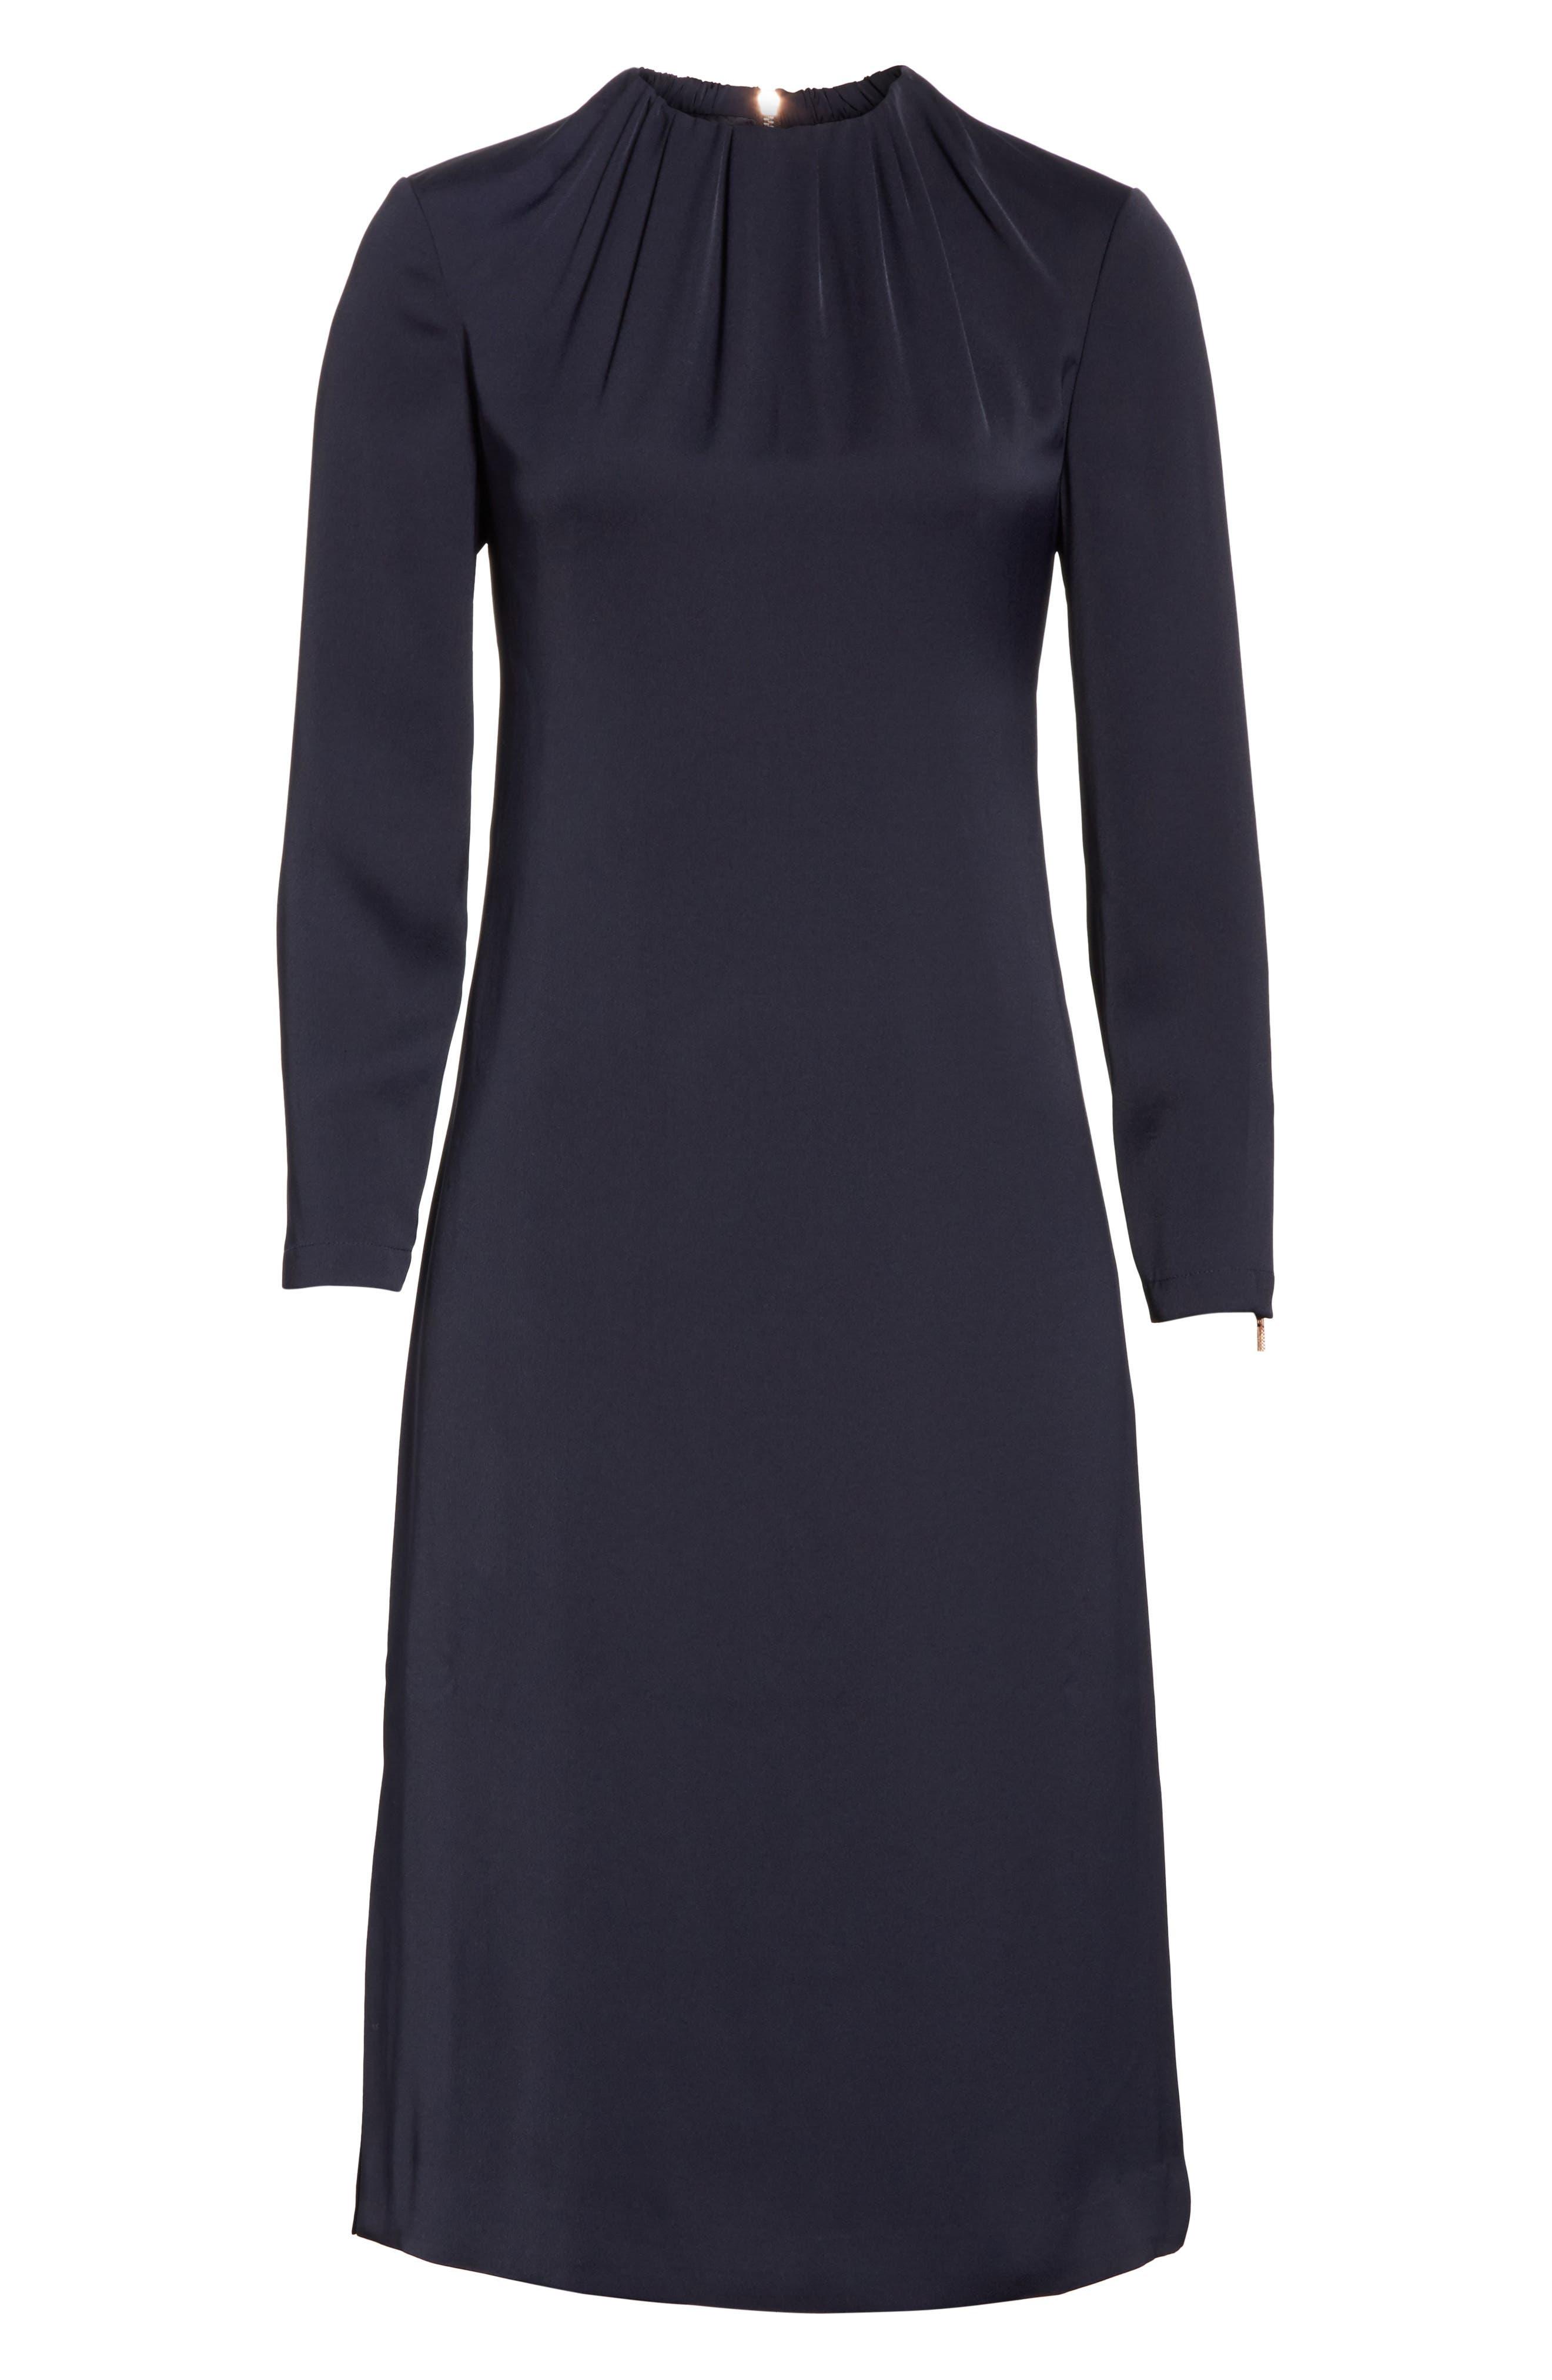 Ruched Neck Dress,                             Alternate thumbnail 5, color,                             Dark Blue